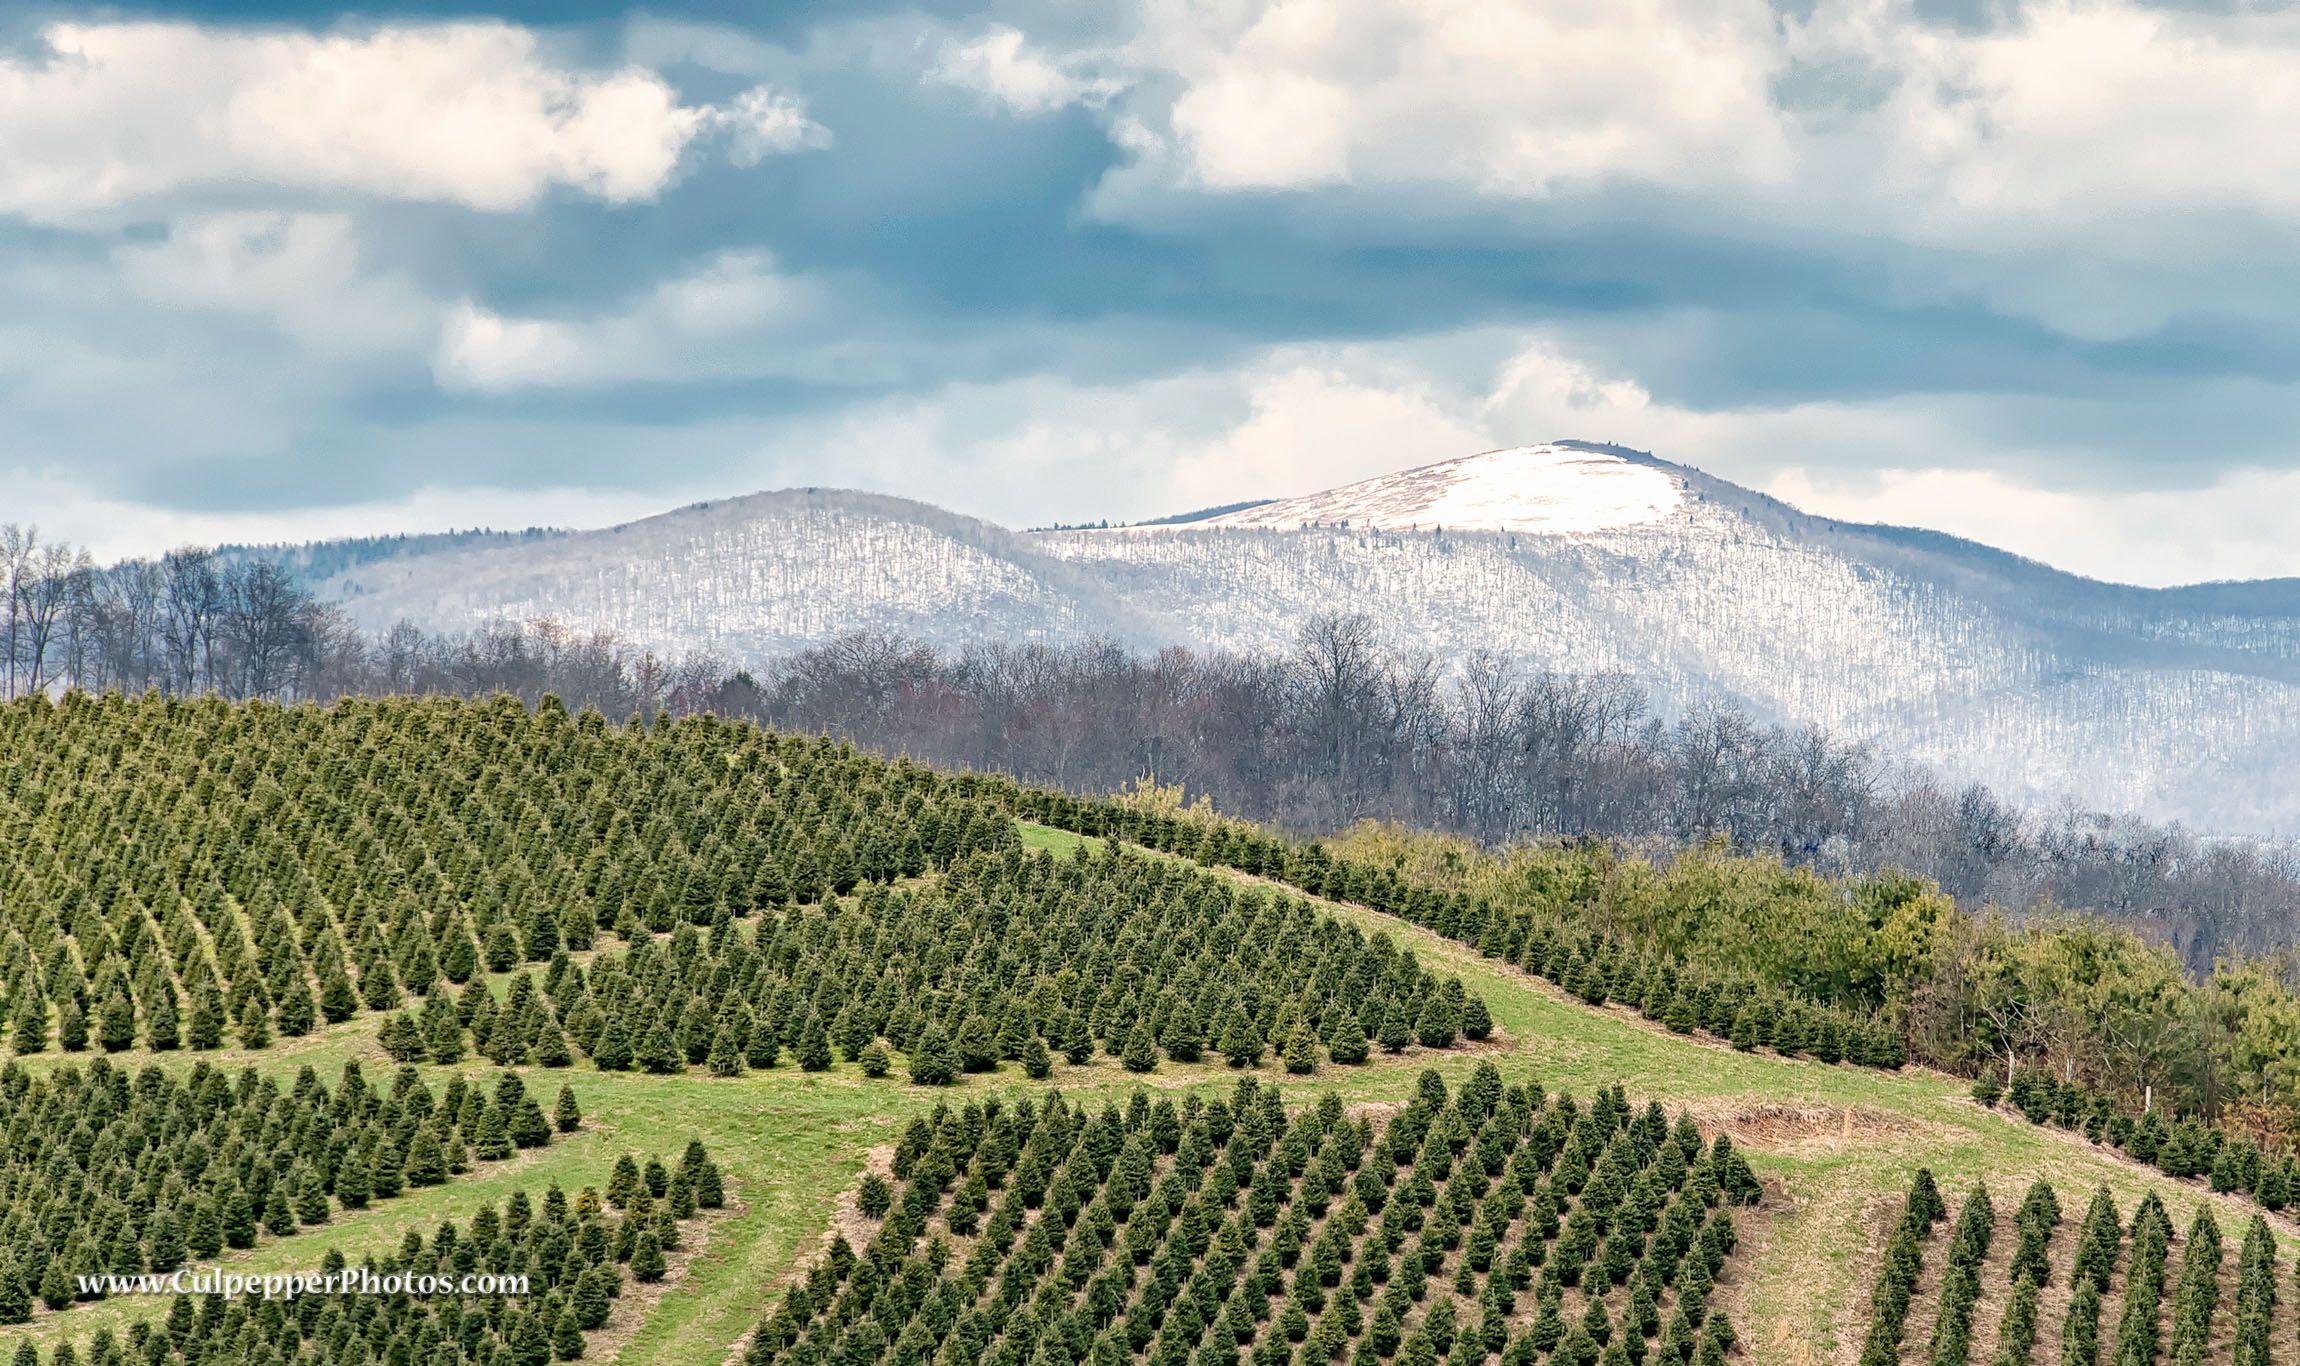 A Christmas Tree farm on highway 421 near Wilkesboro North